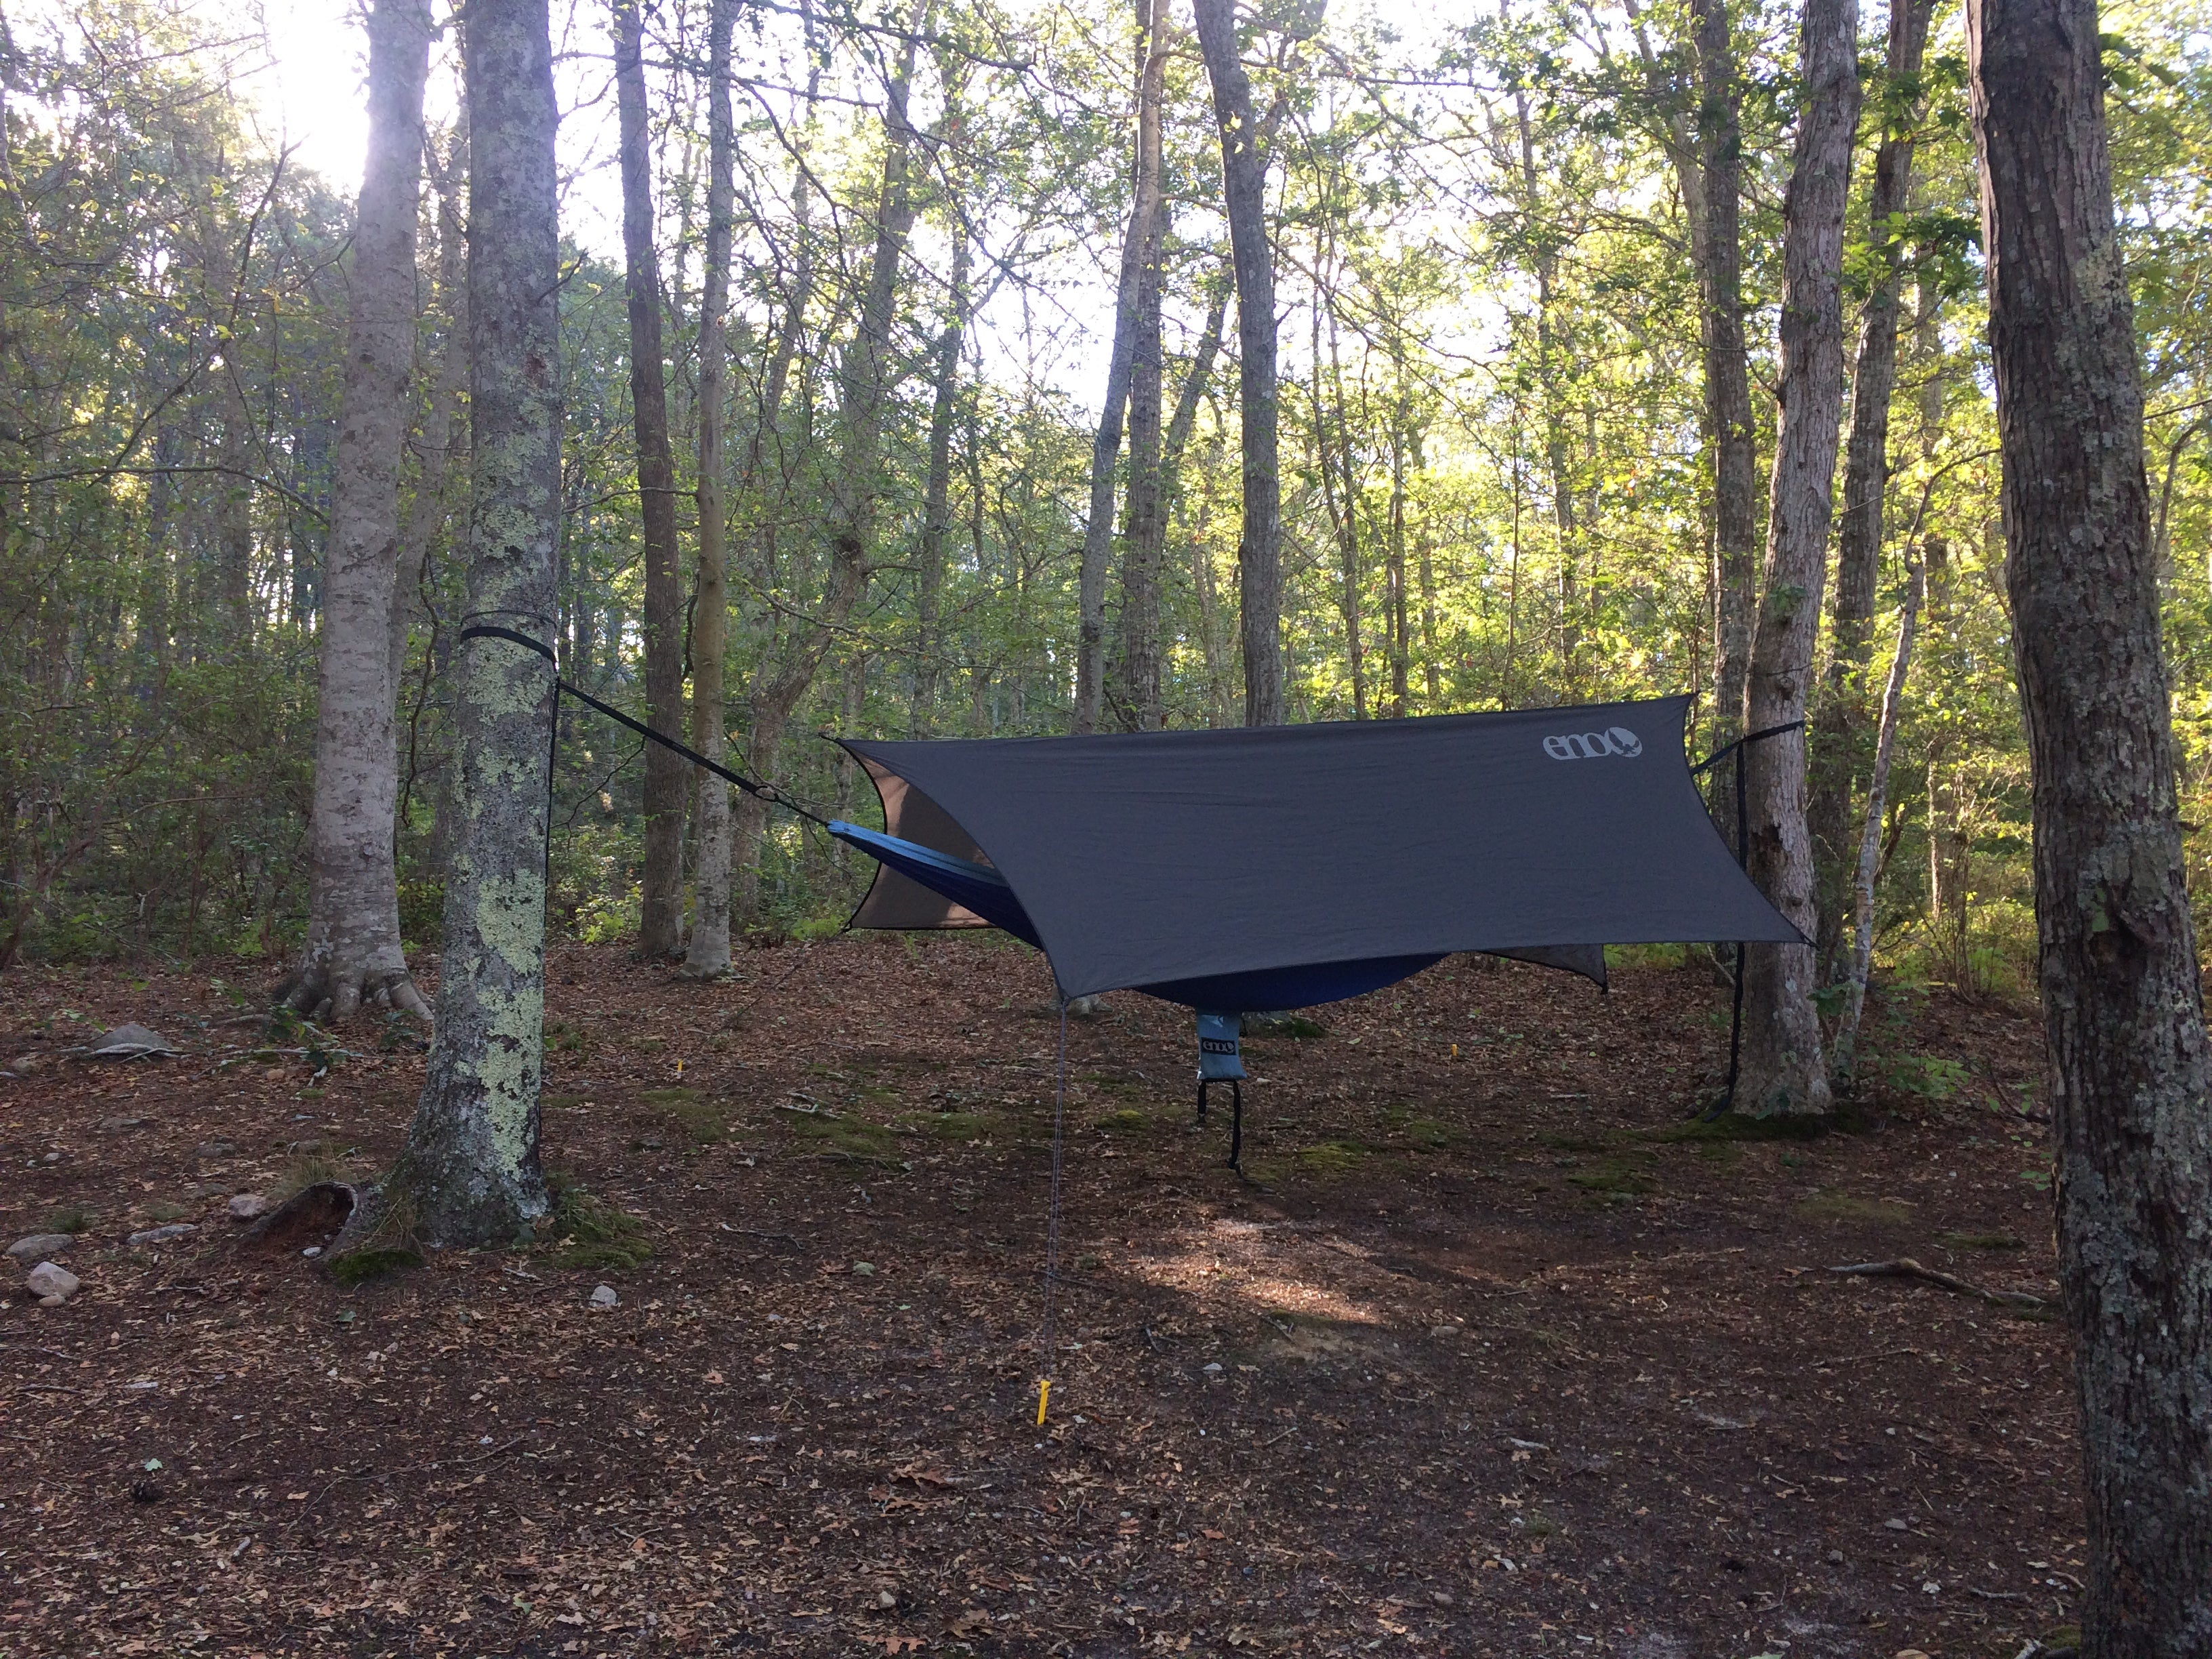 Camping in Loveland